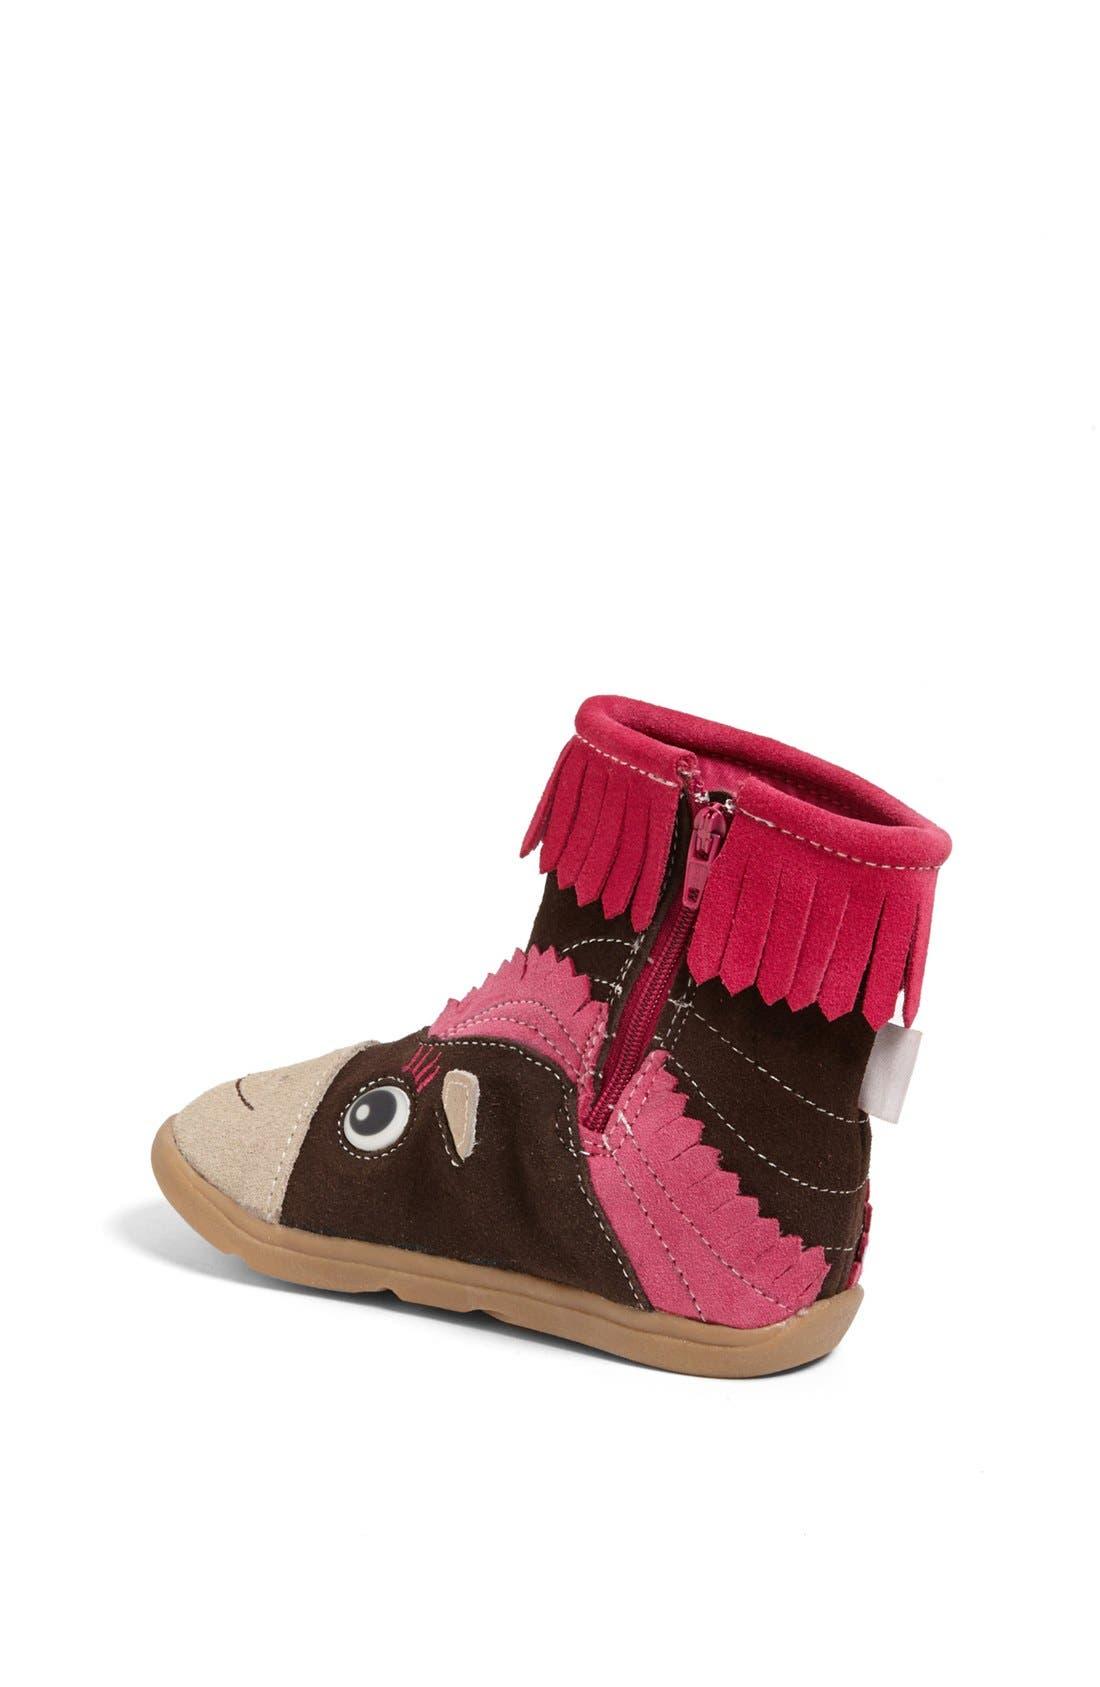 Alternate Image 2  - Zooligans 'Paloma the Pony' Boot (Baby, Walker, Toddler & Little Kid)